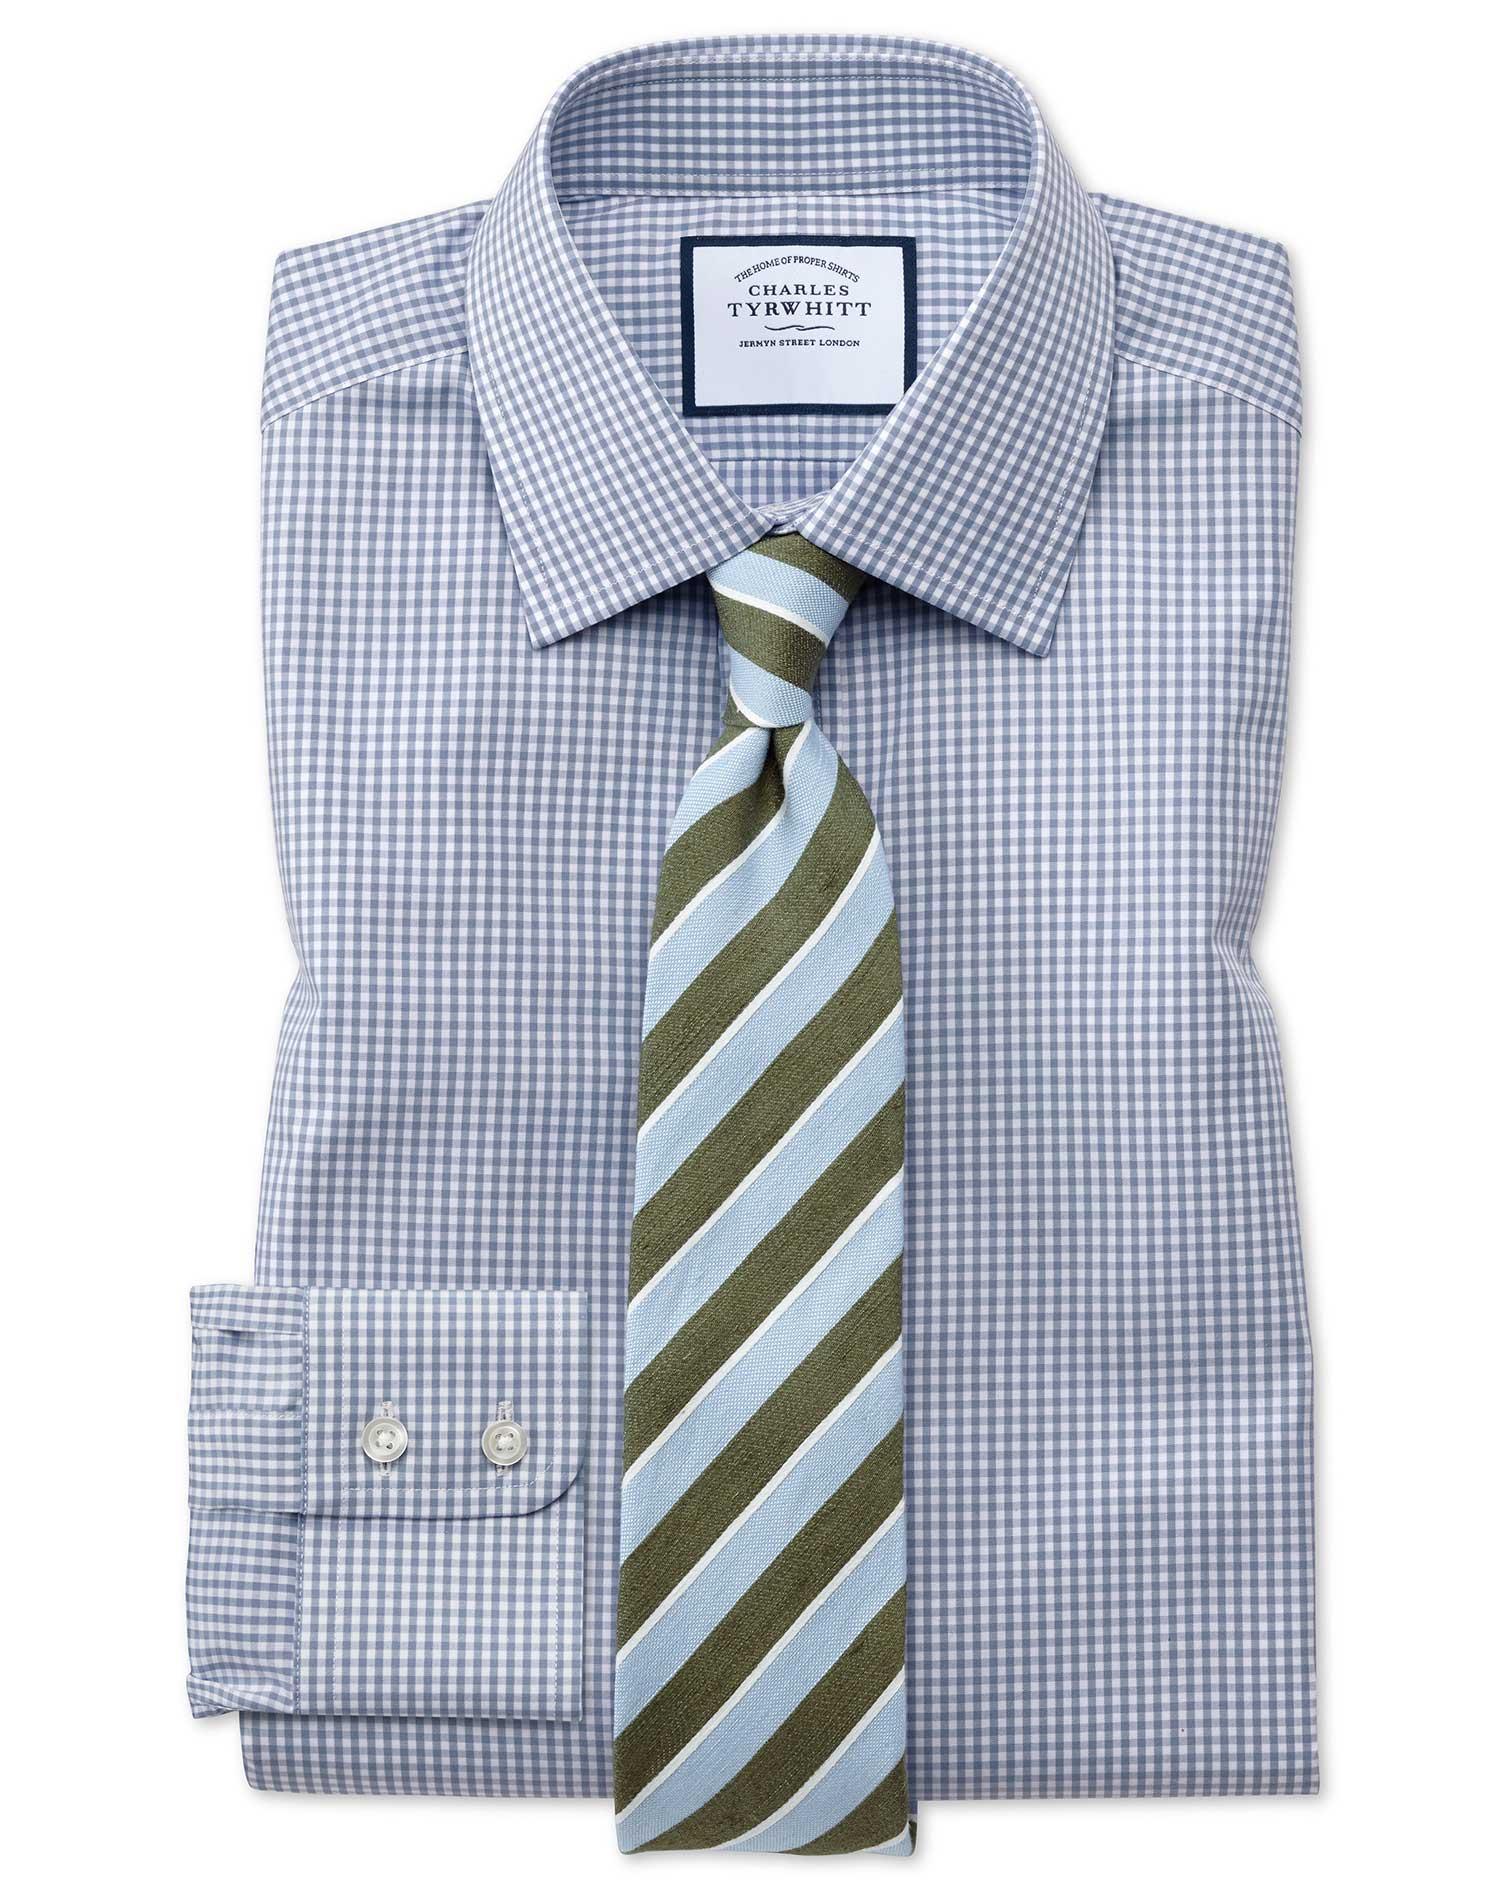 Extra Slim Fit Small Gingham Grey Shirt Charles Tyrwhitt